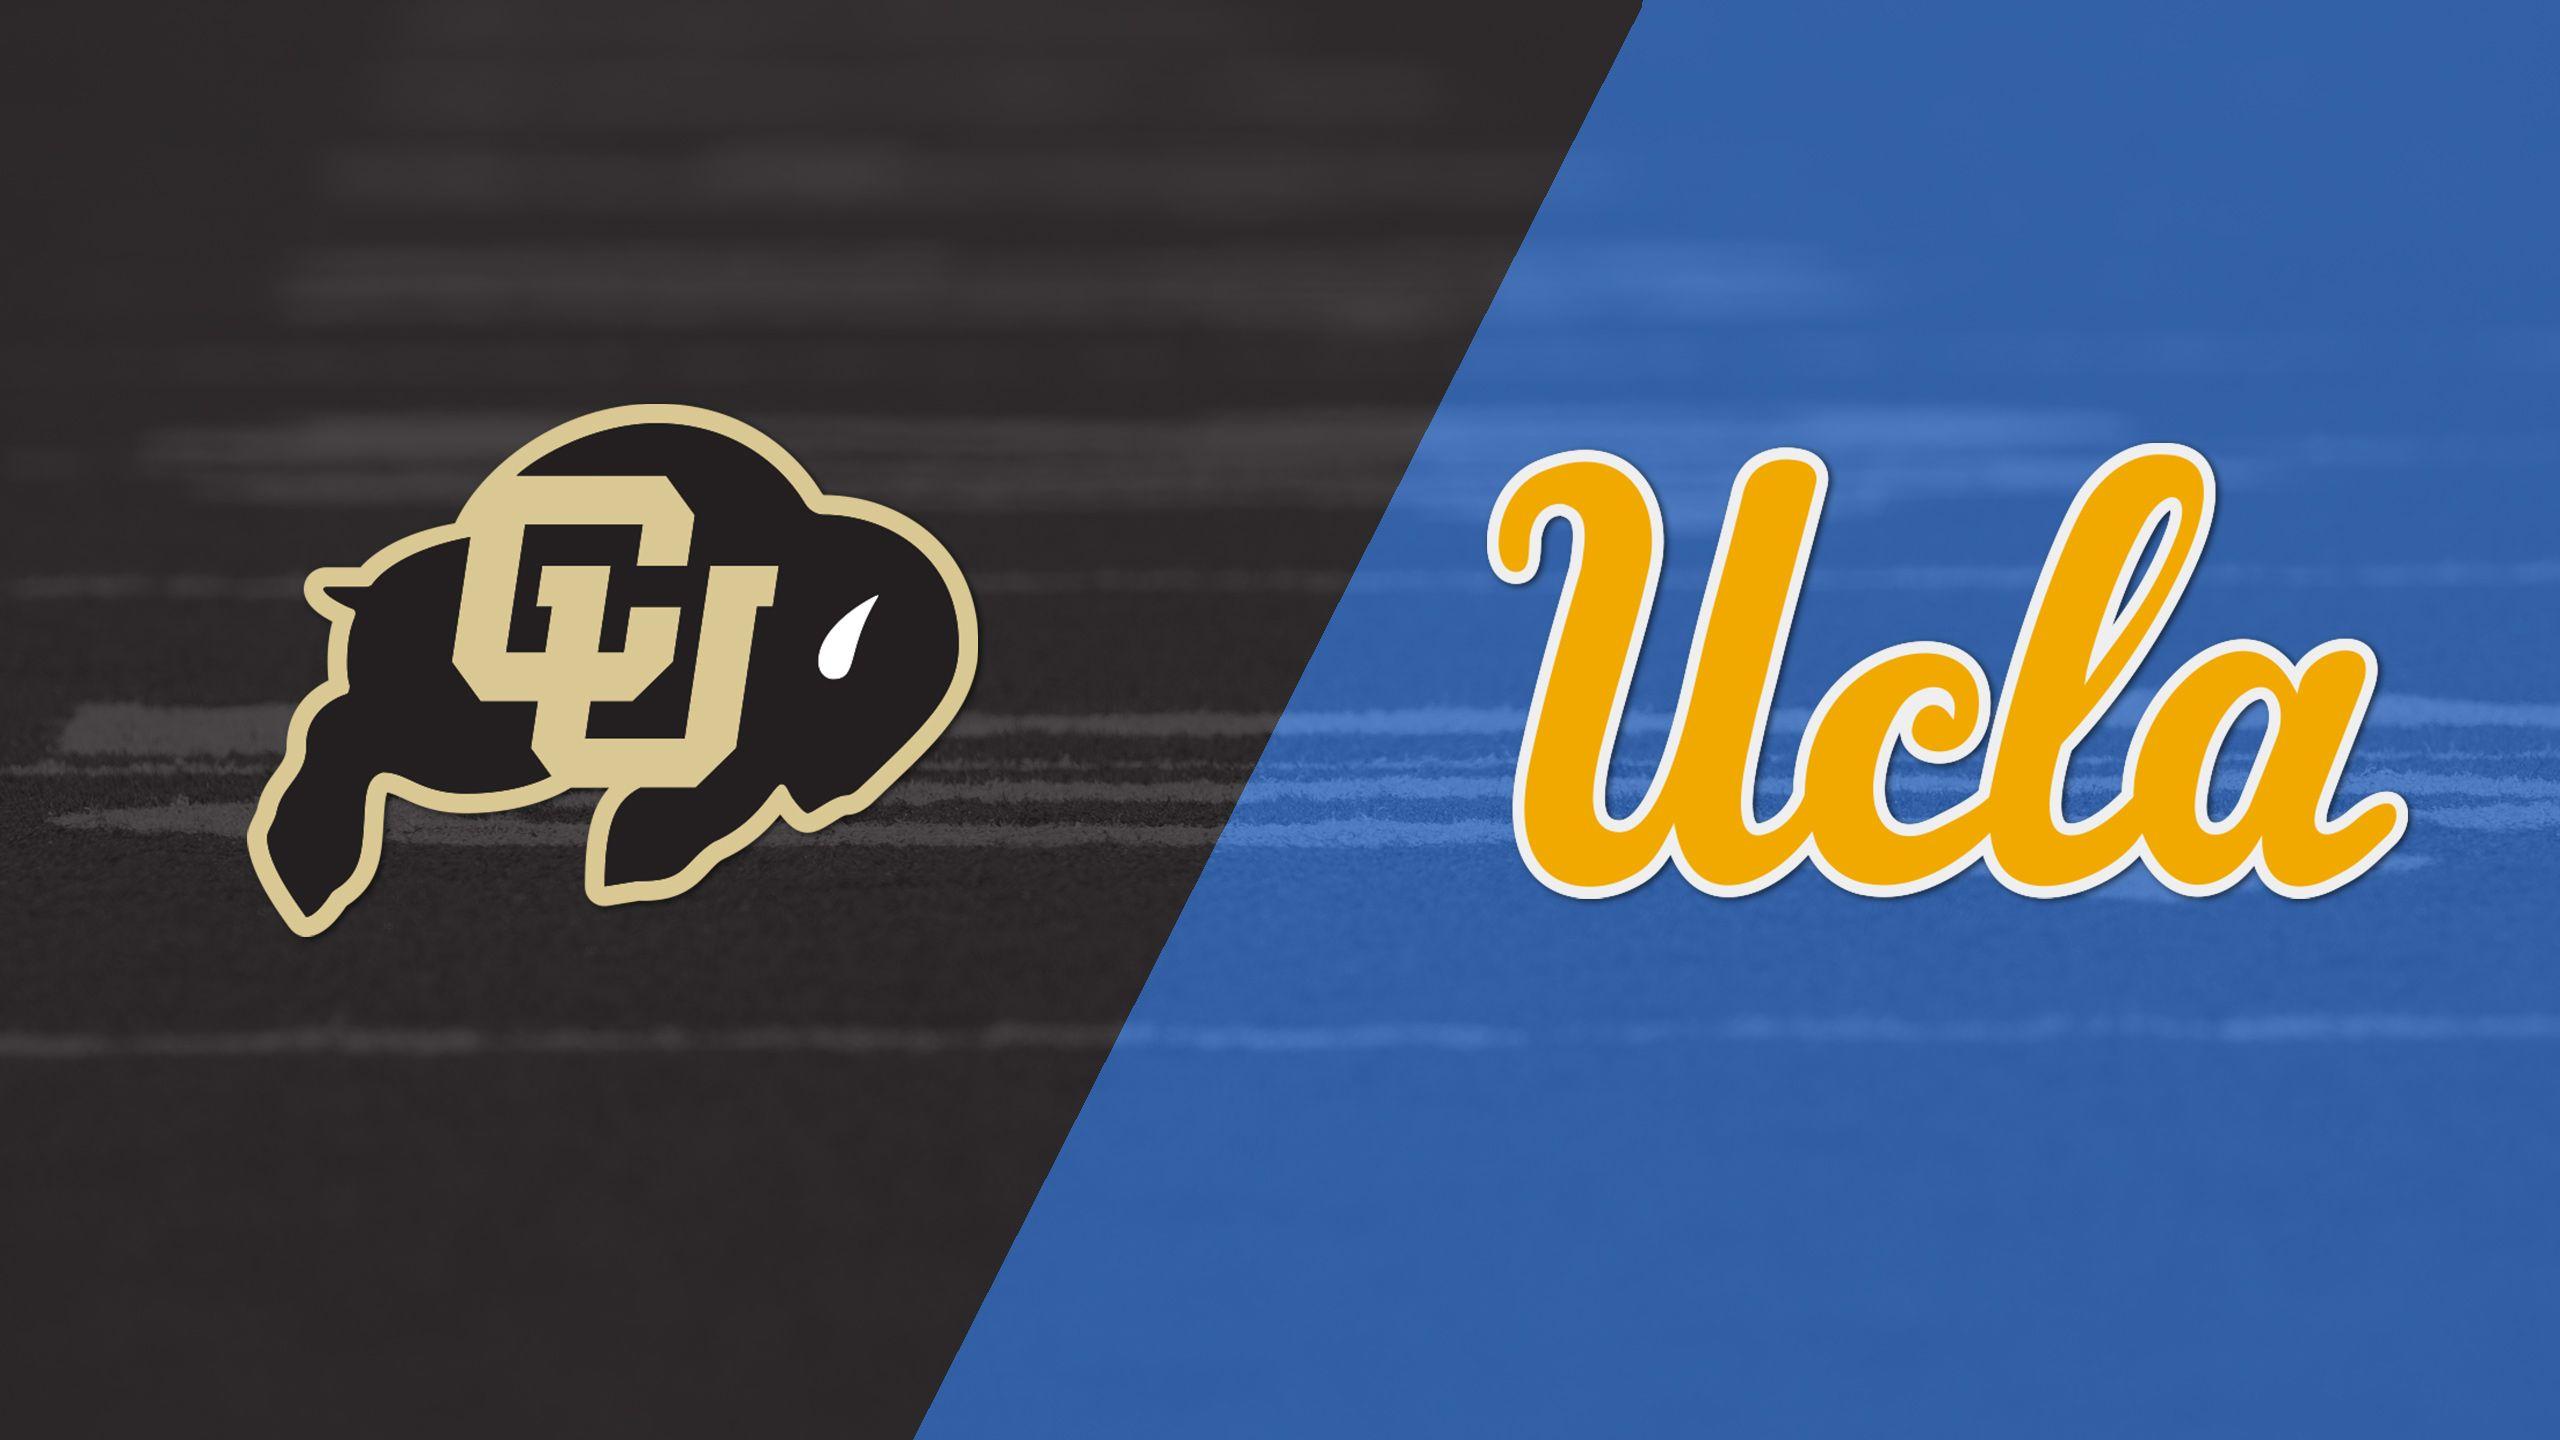 Colorado vs. UCLA (Football) (re-air)